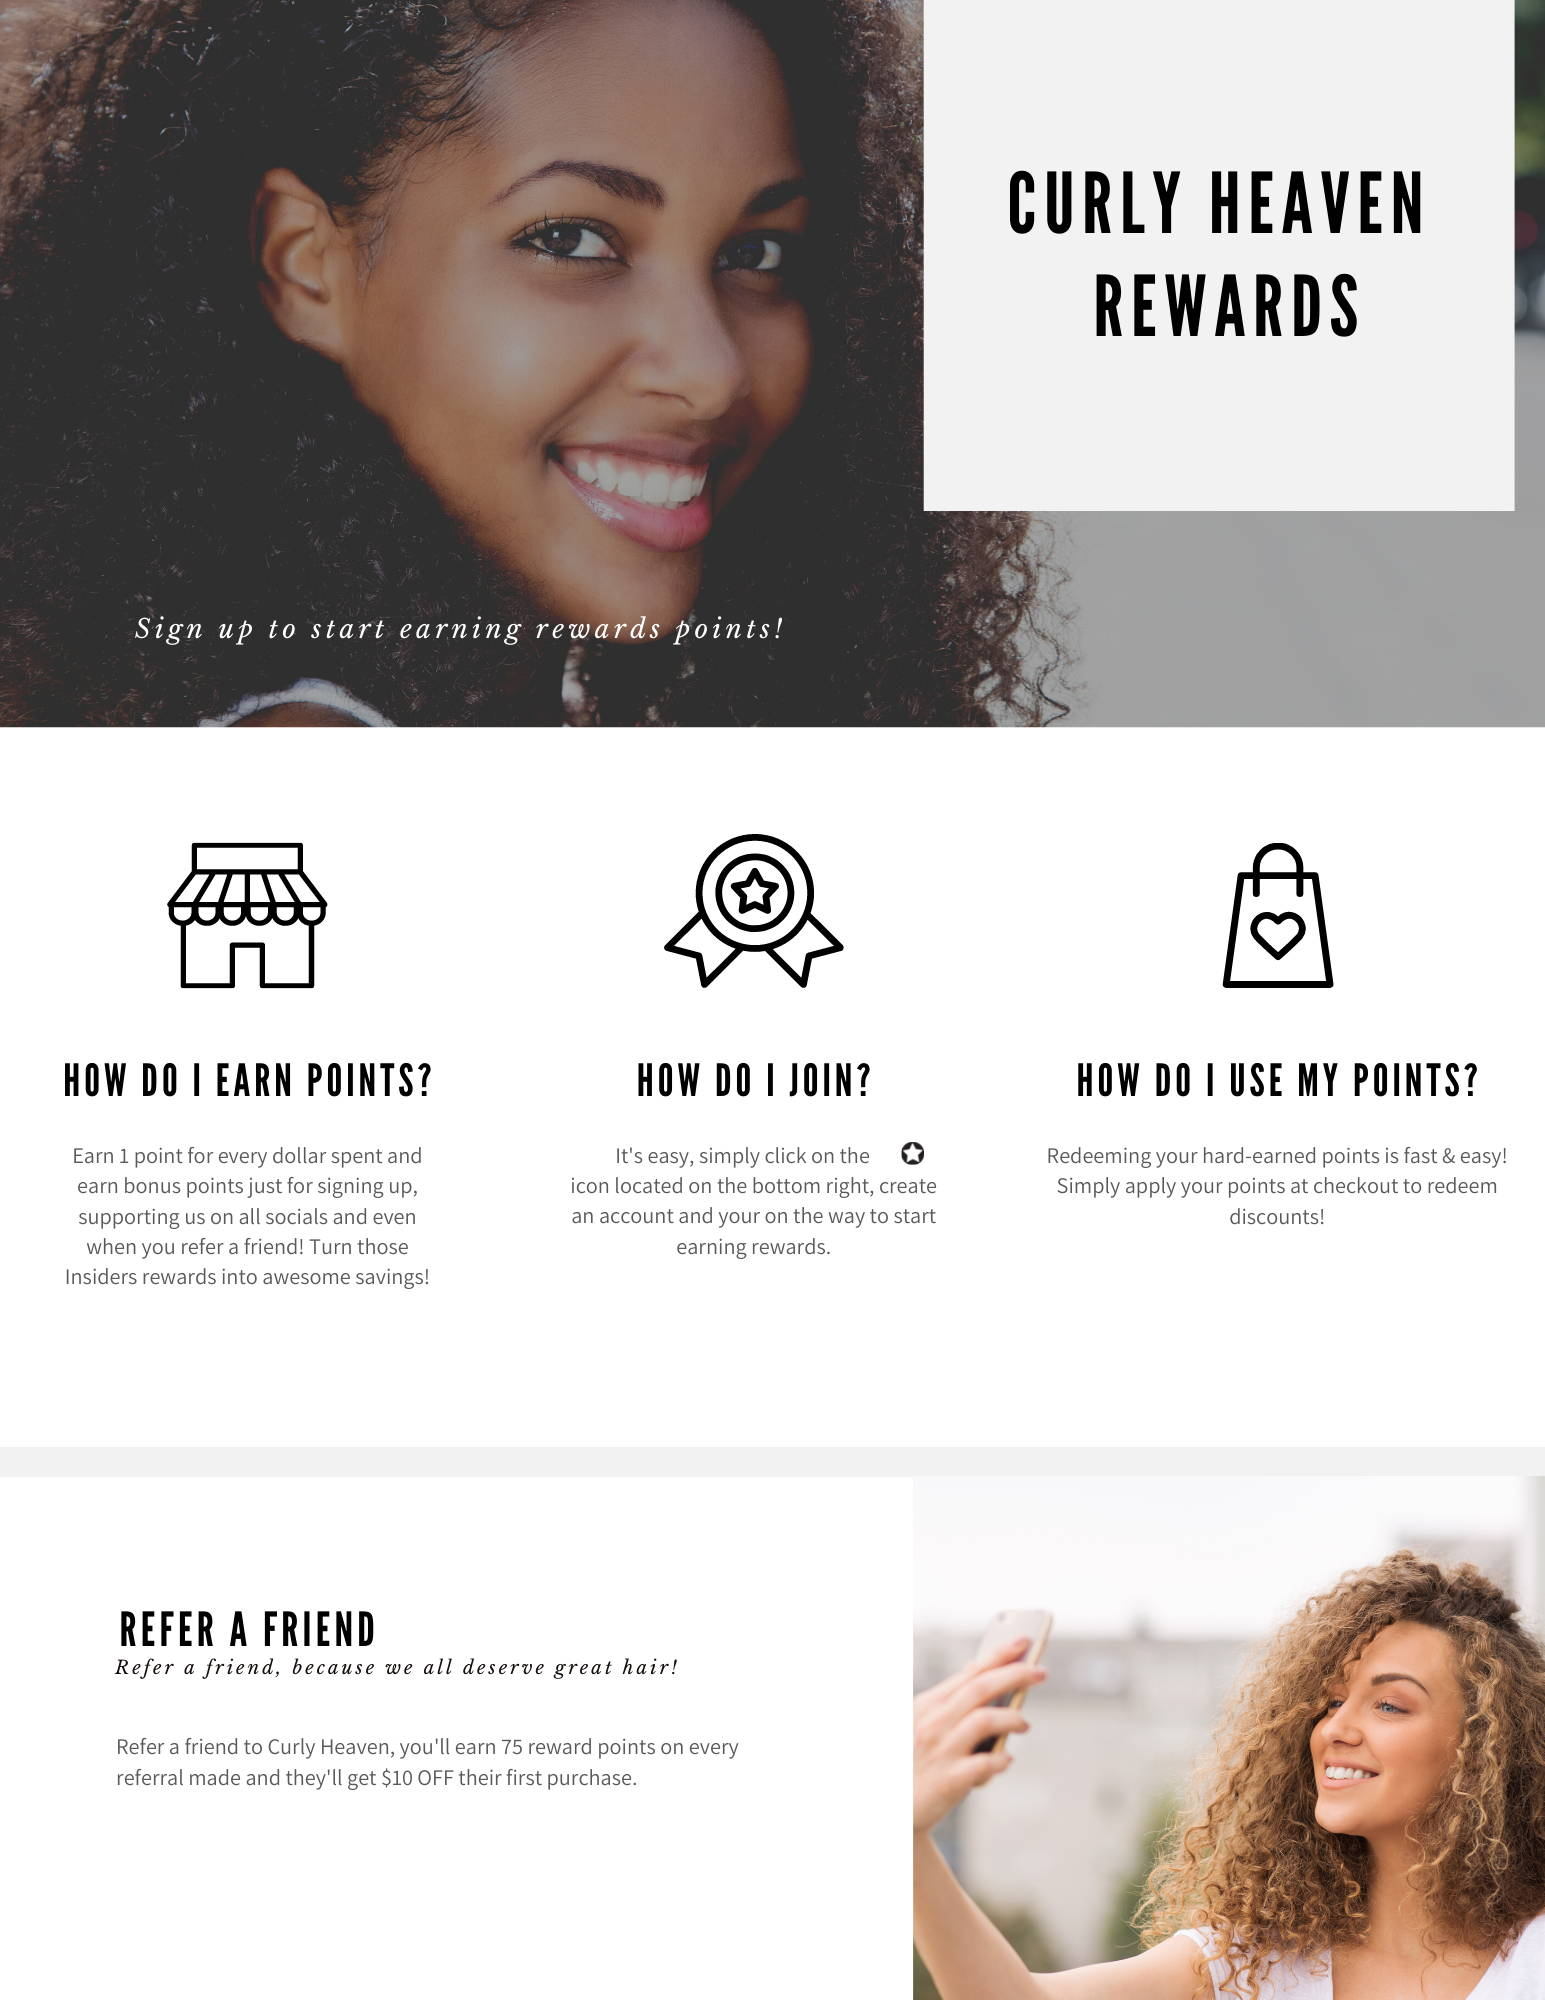 Curly Heaven Rewards Program